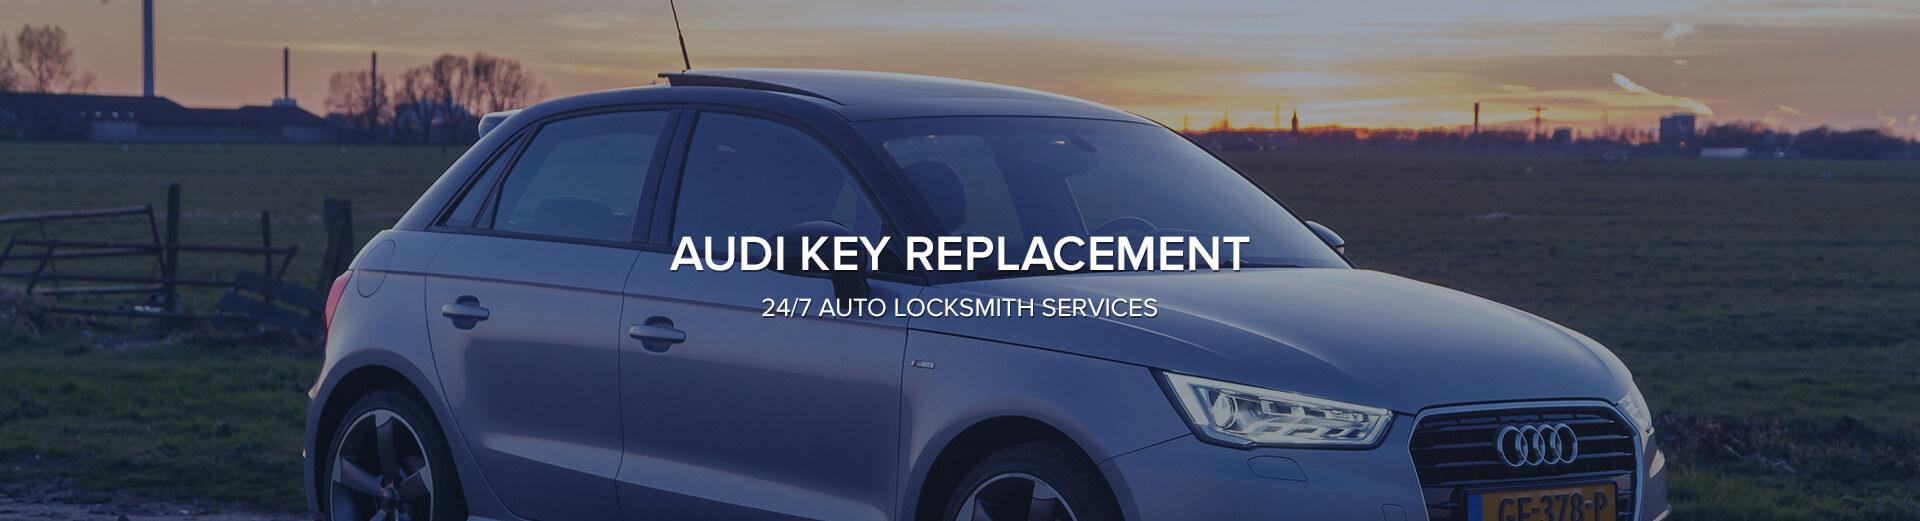 benz key replacement programming dubai locksmith services audi mercedes car